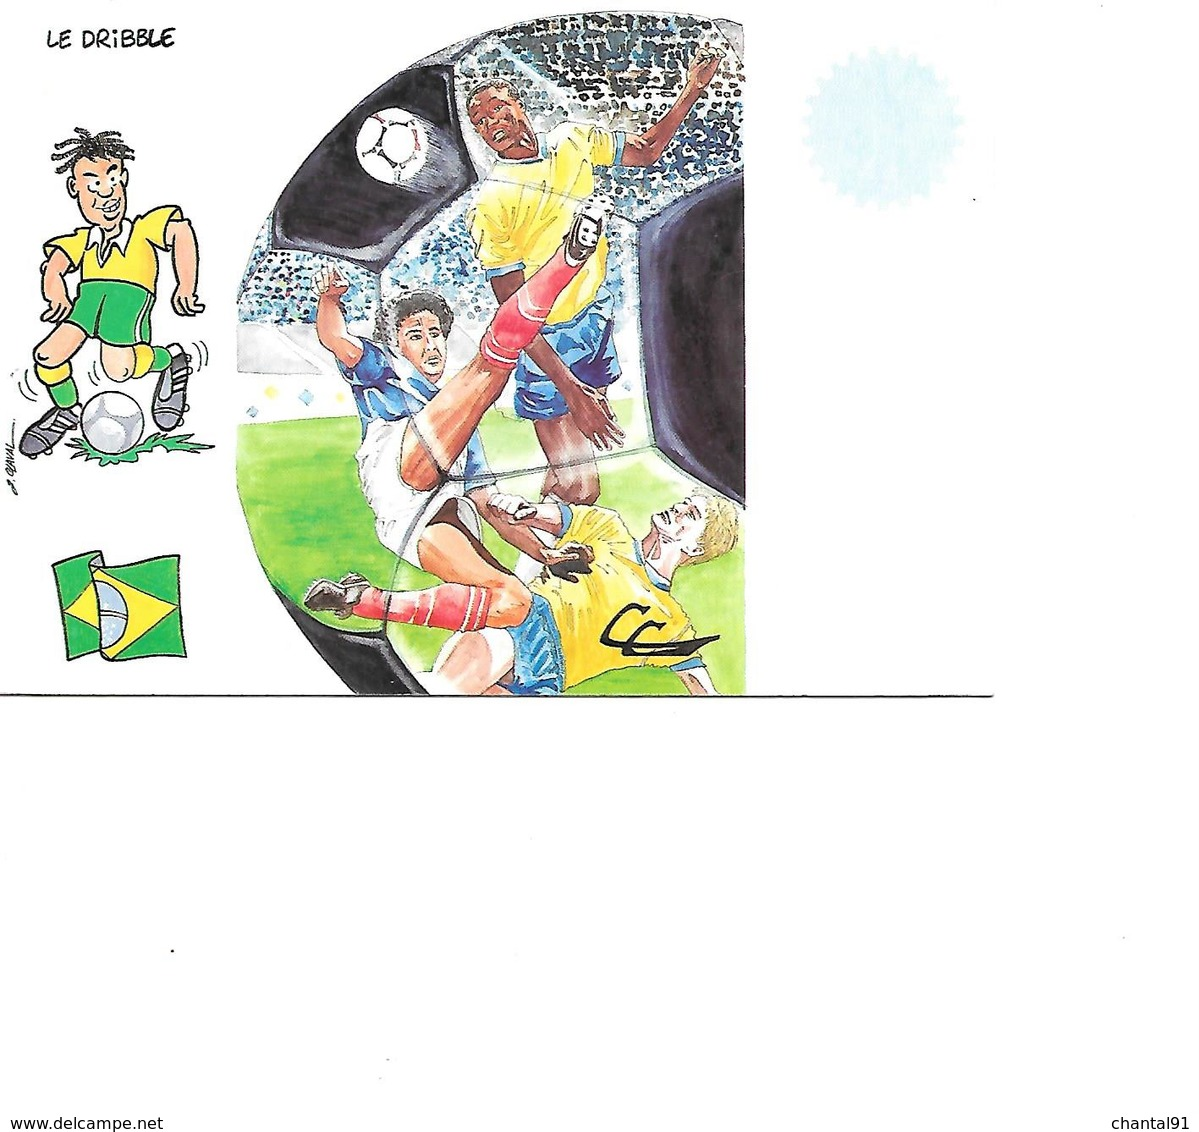 CARTE POSTALE SPORT MONDIAL 1998 LE DRIBBLE - Fussball